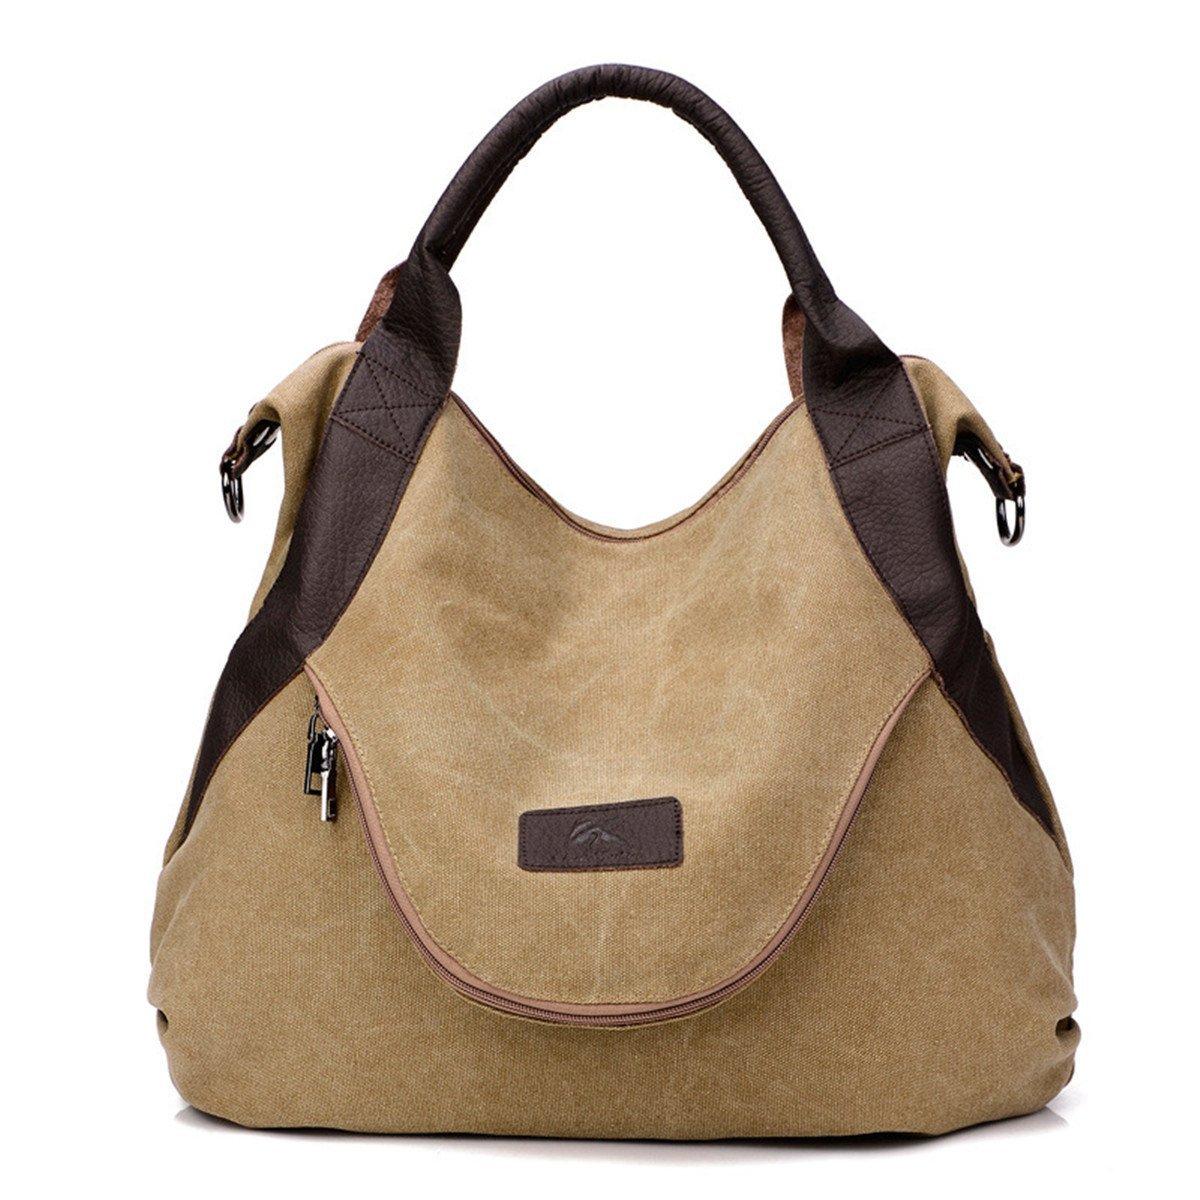 Wyhui Large Pocket Casual Women's Handbag Shoulder Cross body Handbags Canvas Leather Large Capacity Bags For Women Dark khaki one size